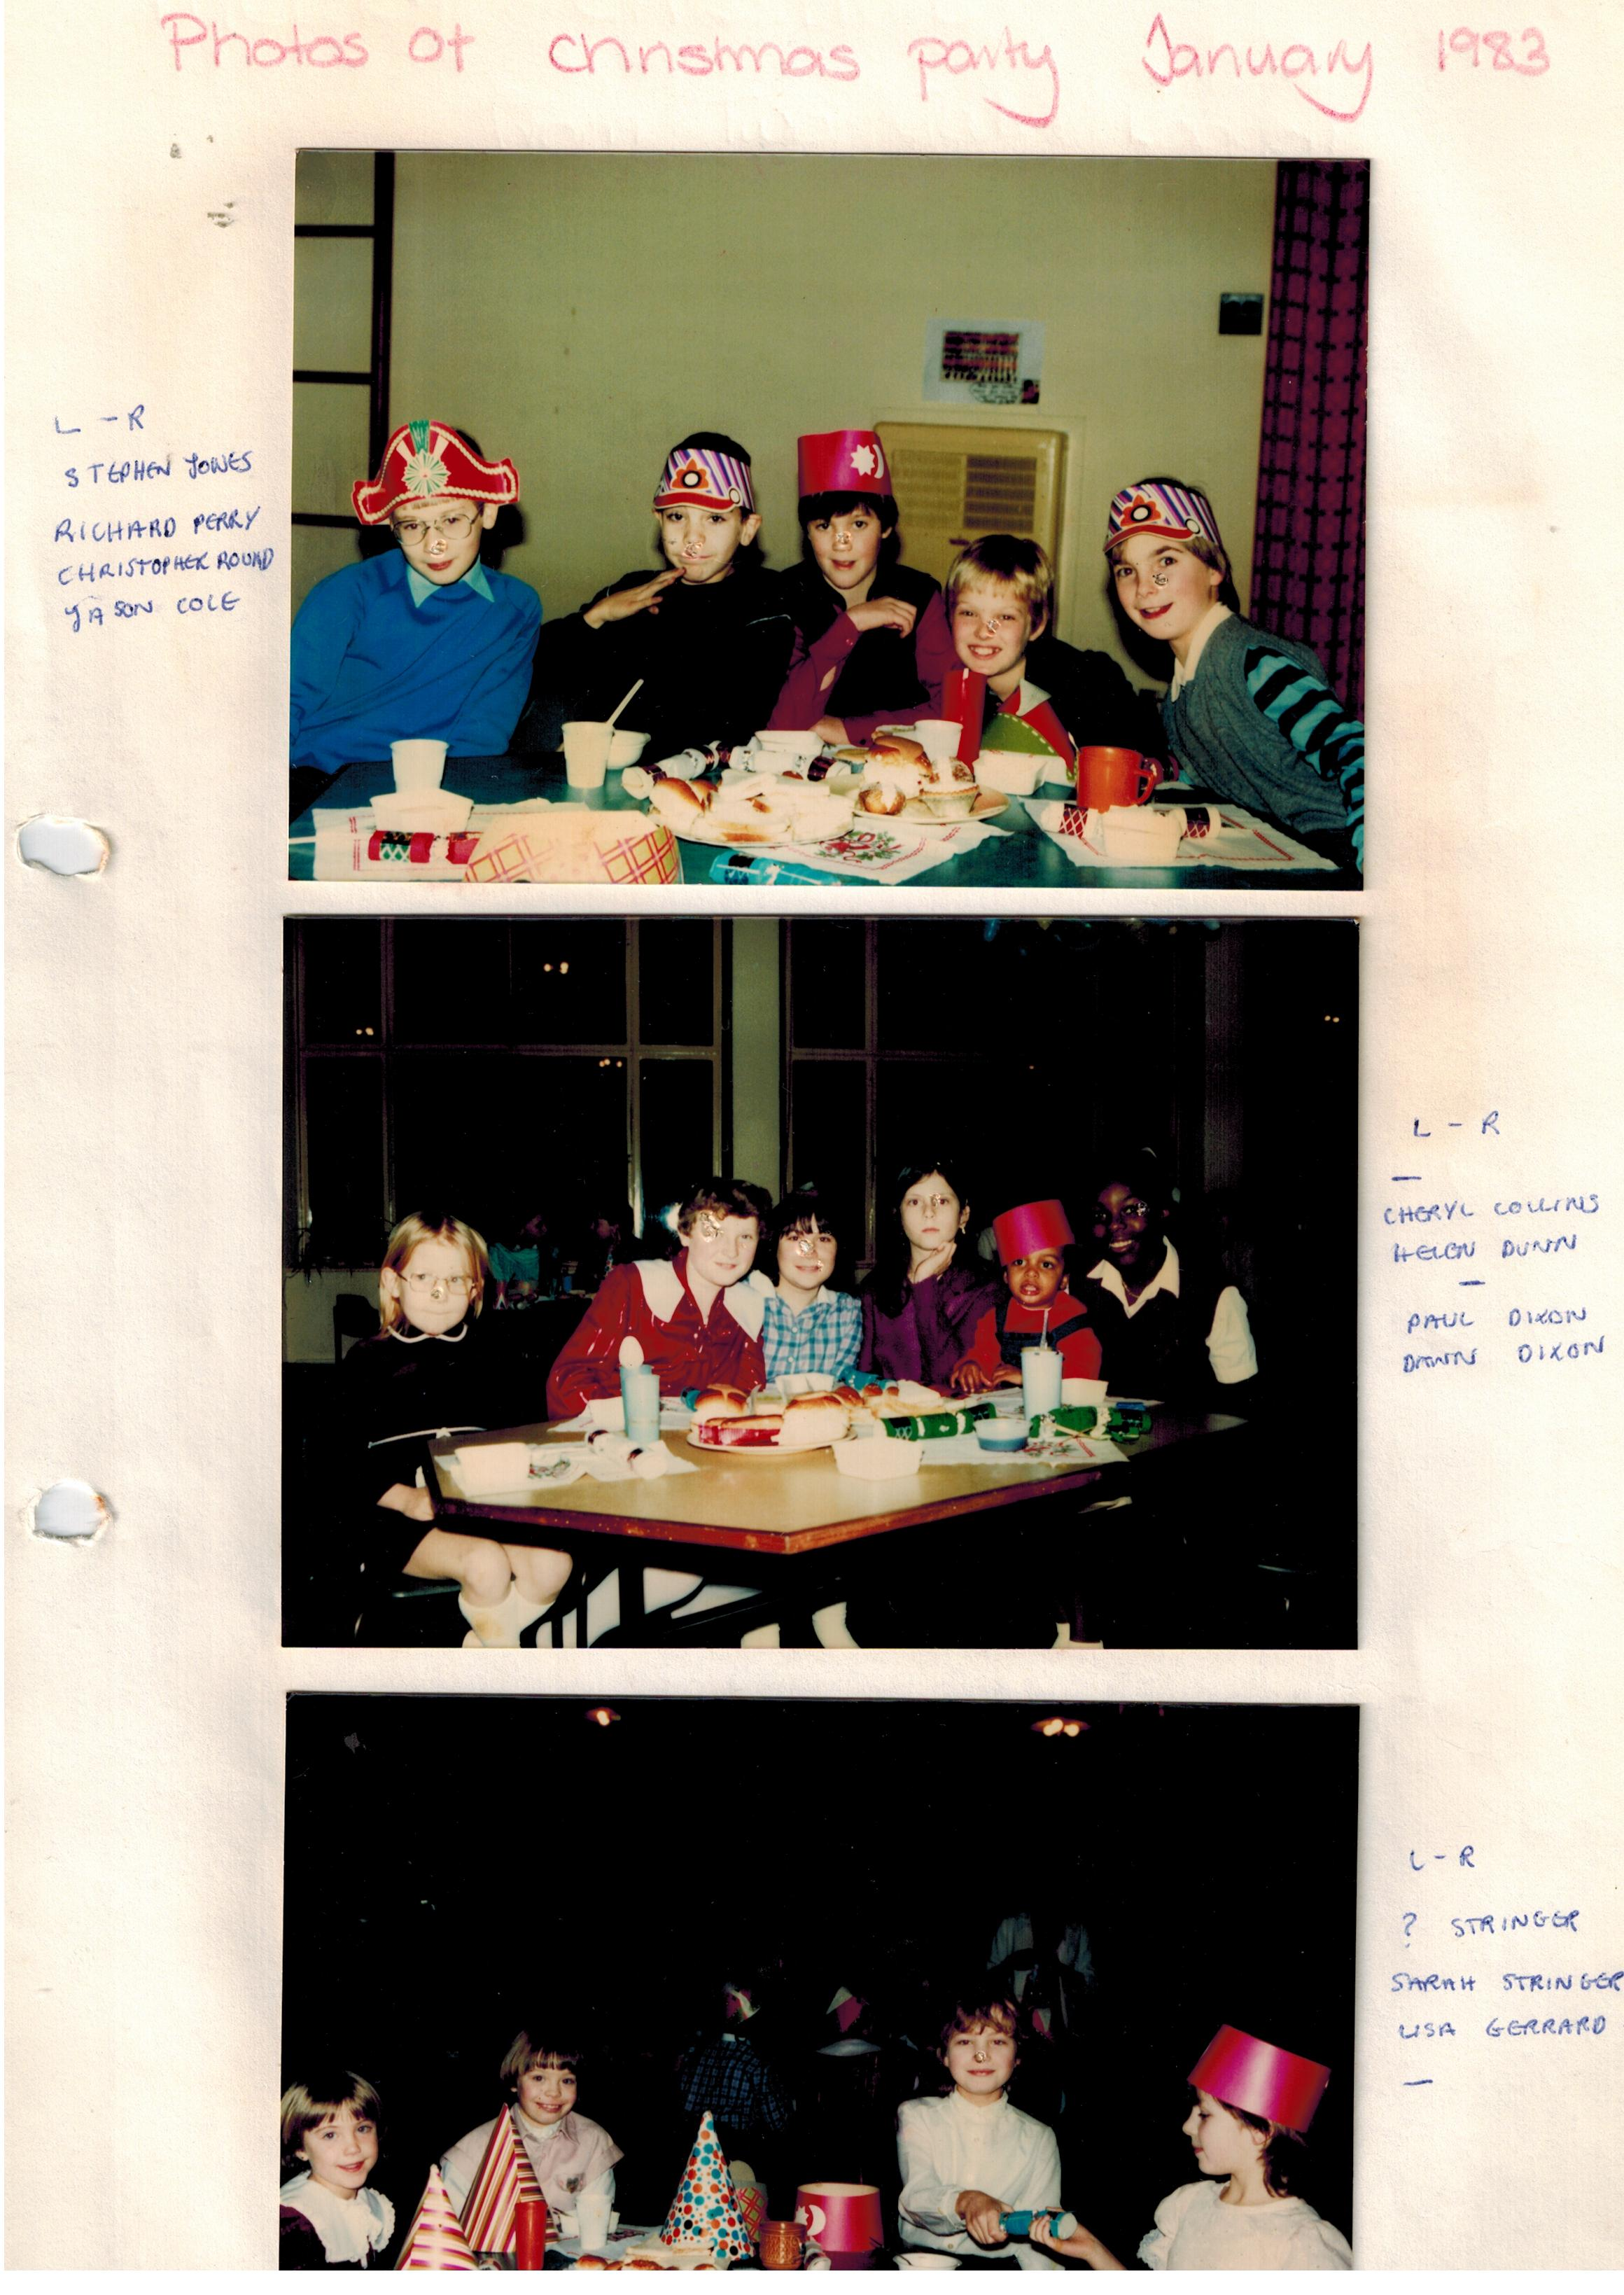 P280_Xmas-party-[1983-Jan]